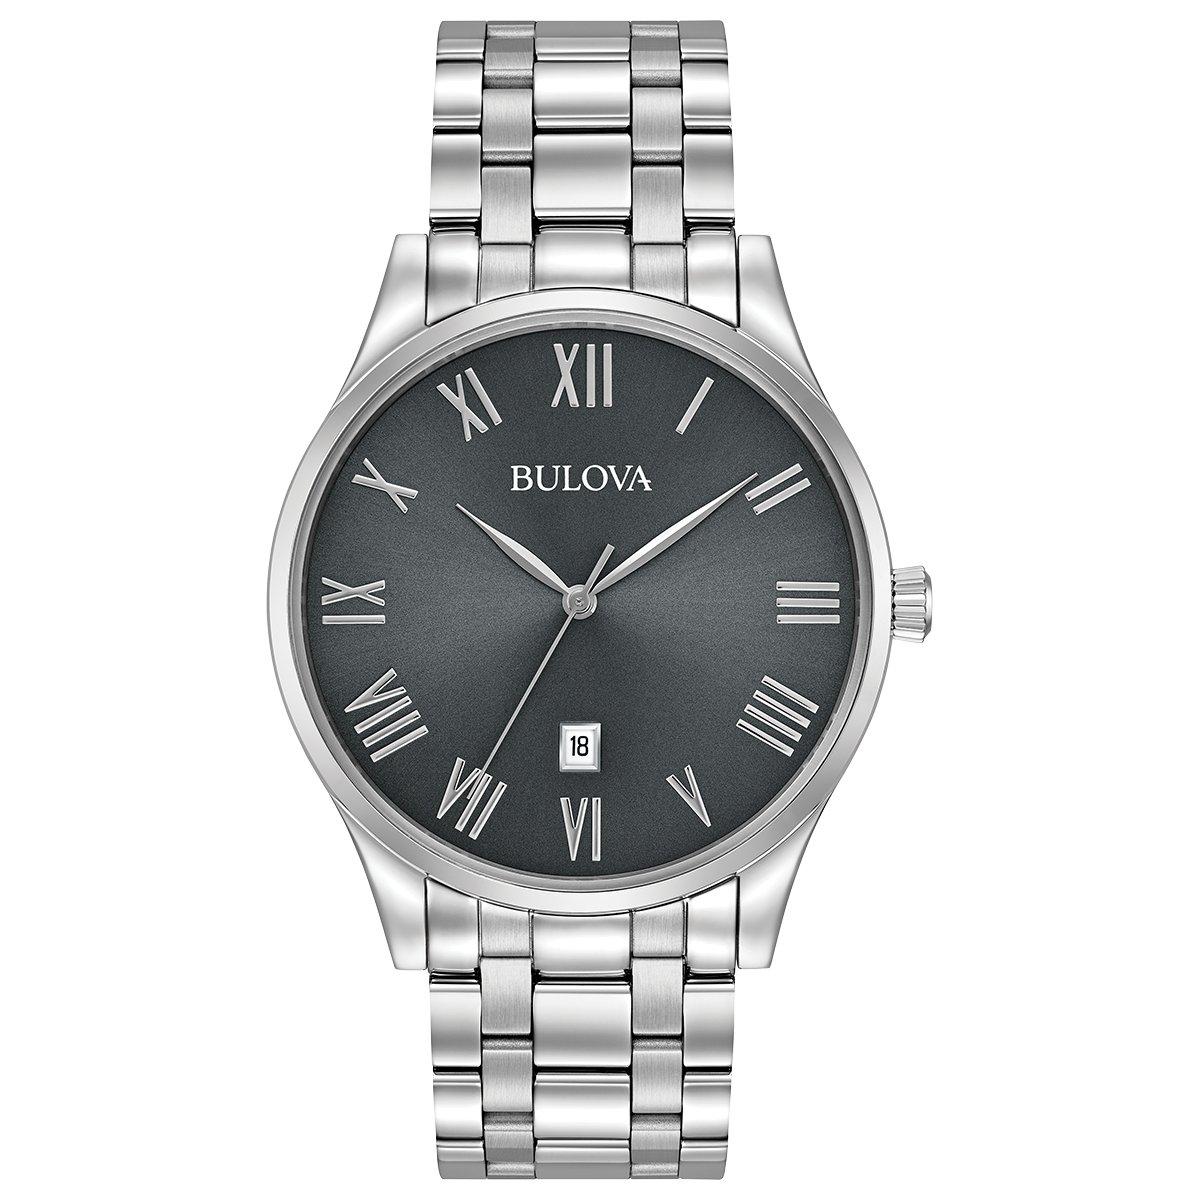 787a34d908d5 Reloj Caballero Bulova 96B261